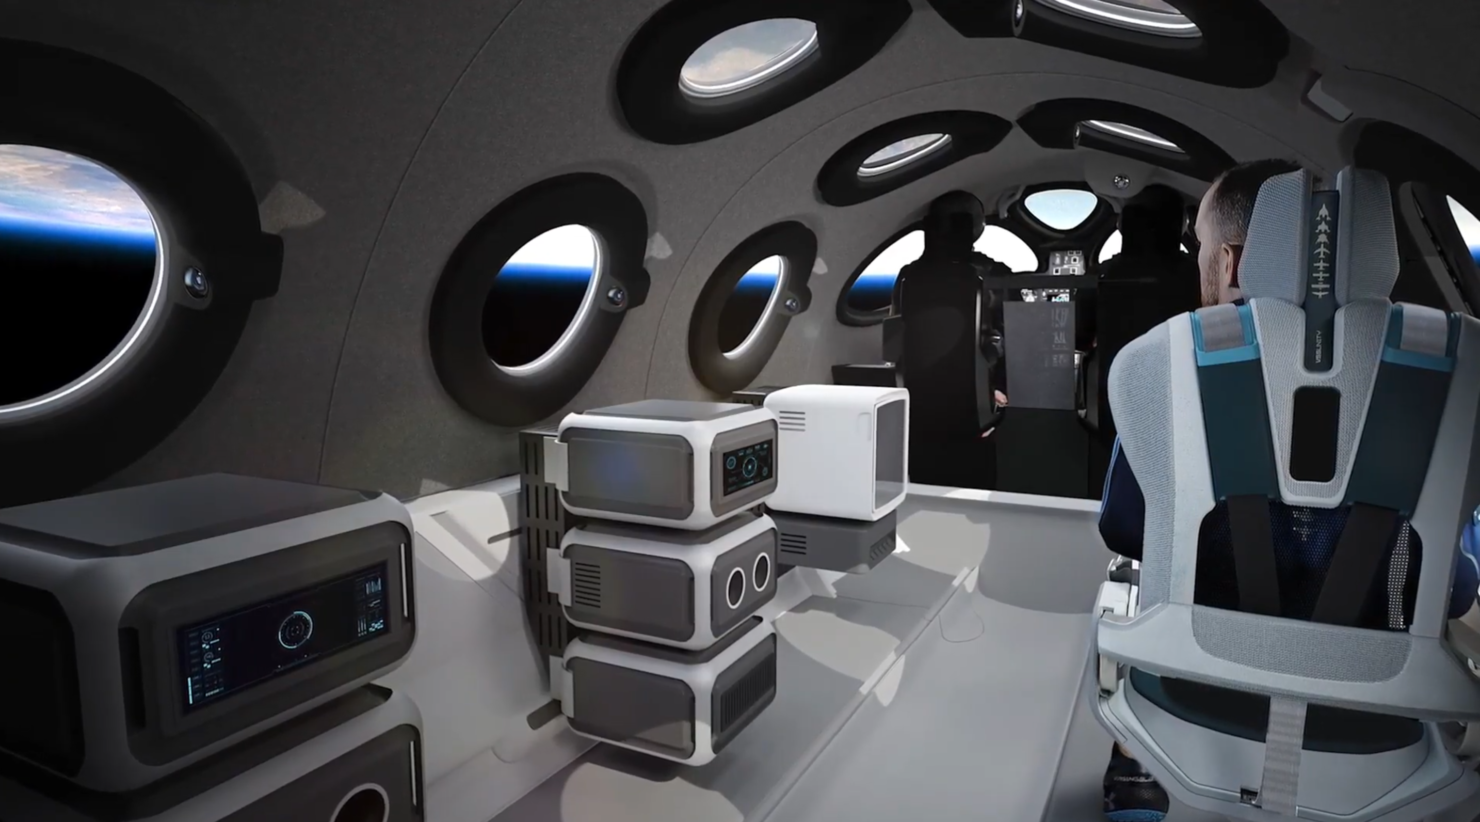 spaceshiptwo-cargo-configuration